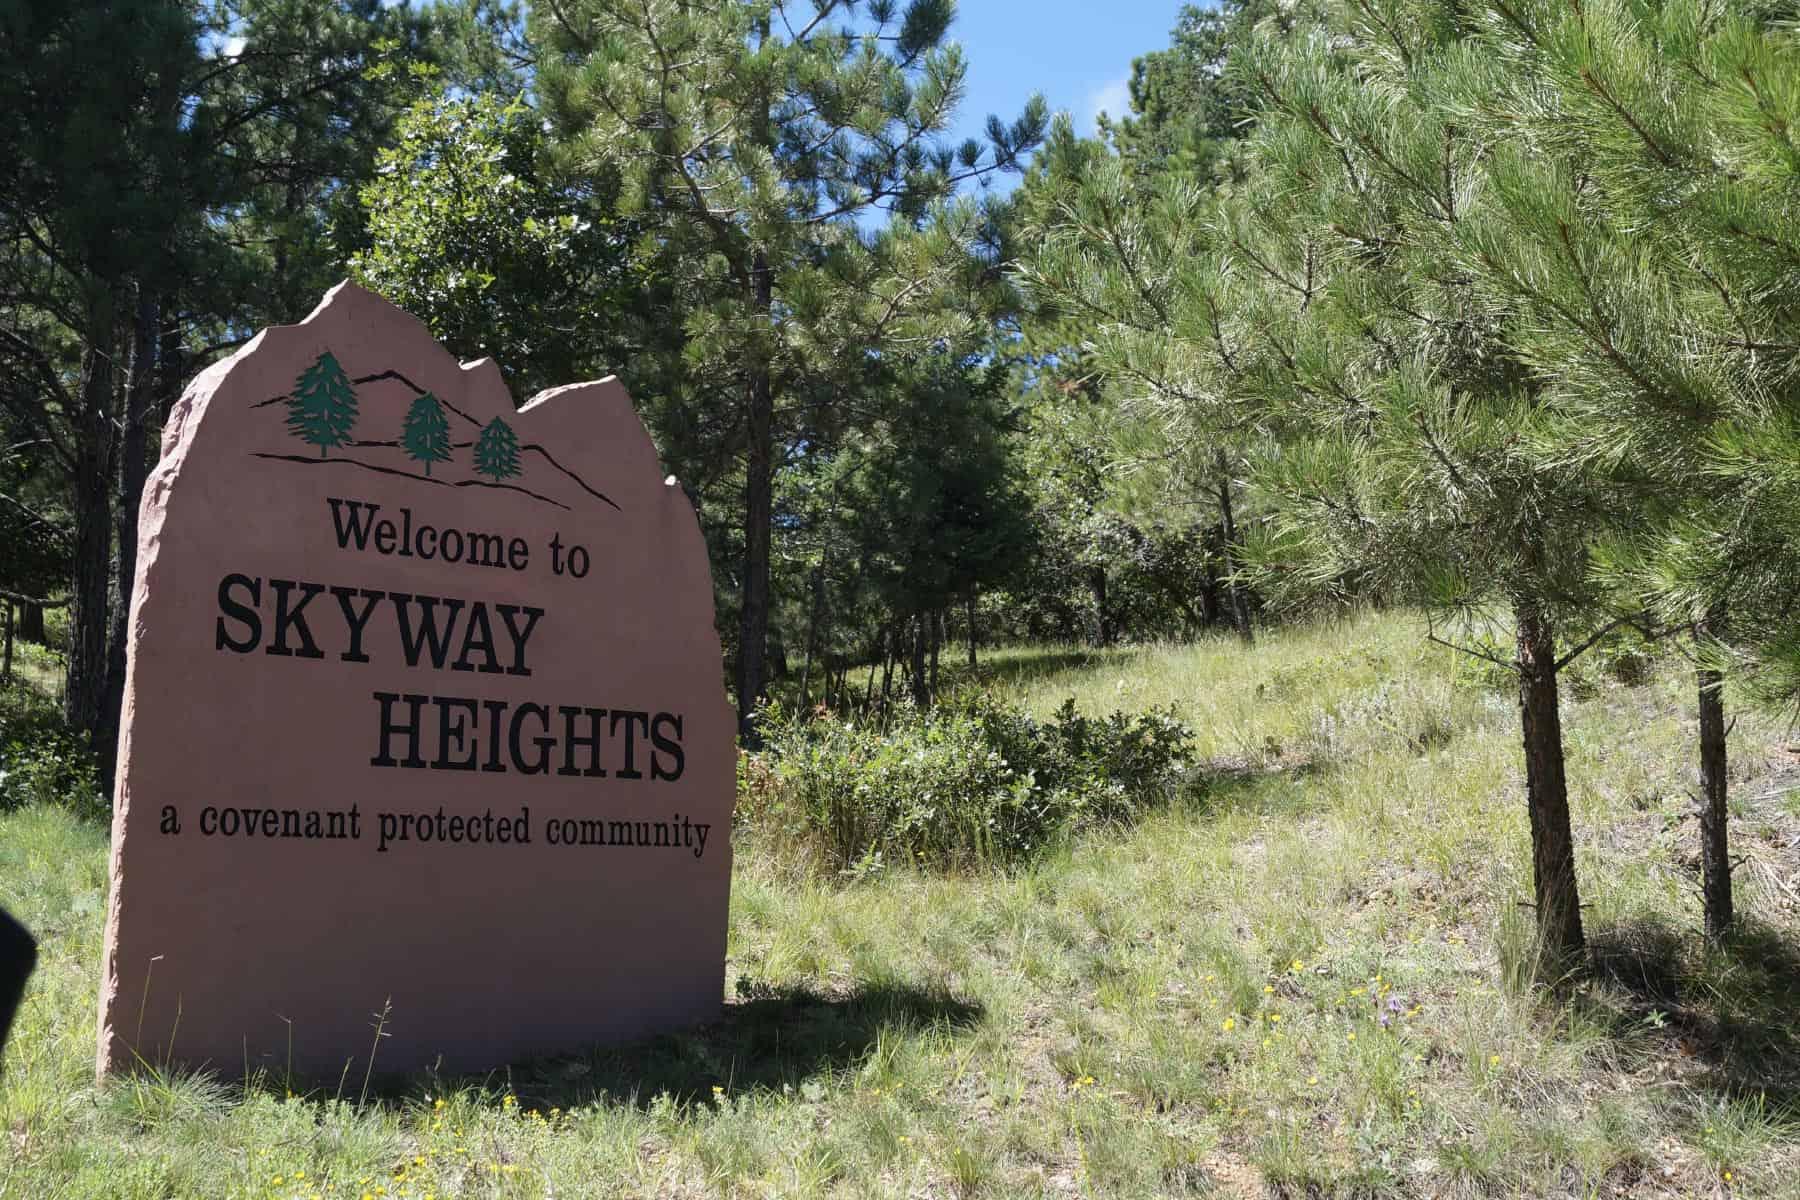 Skyway Heights